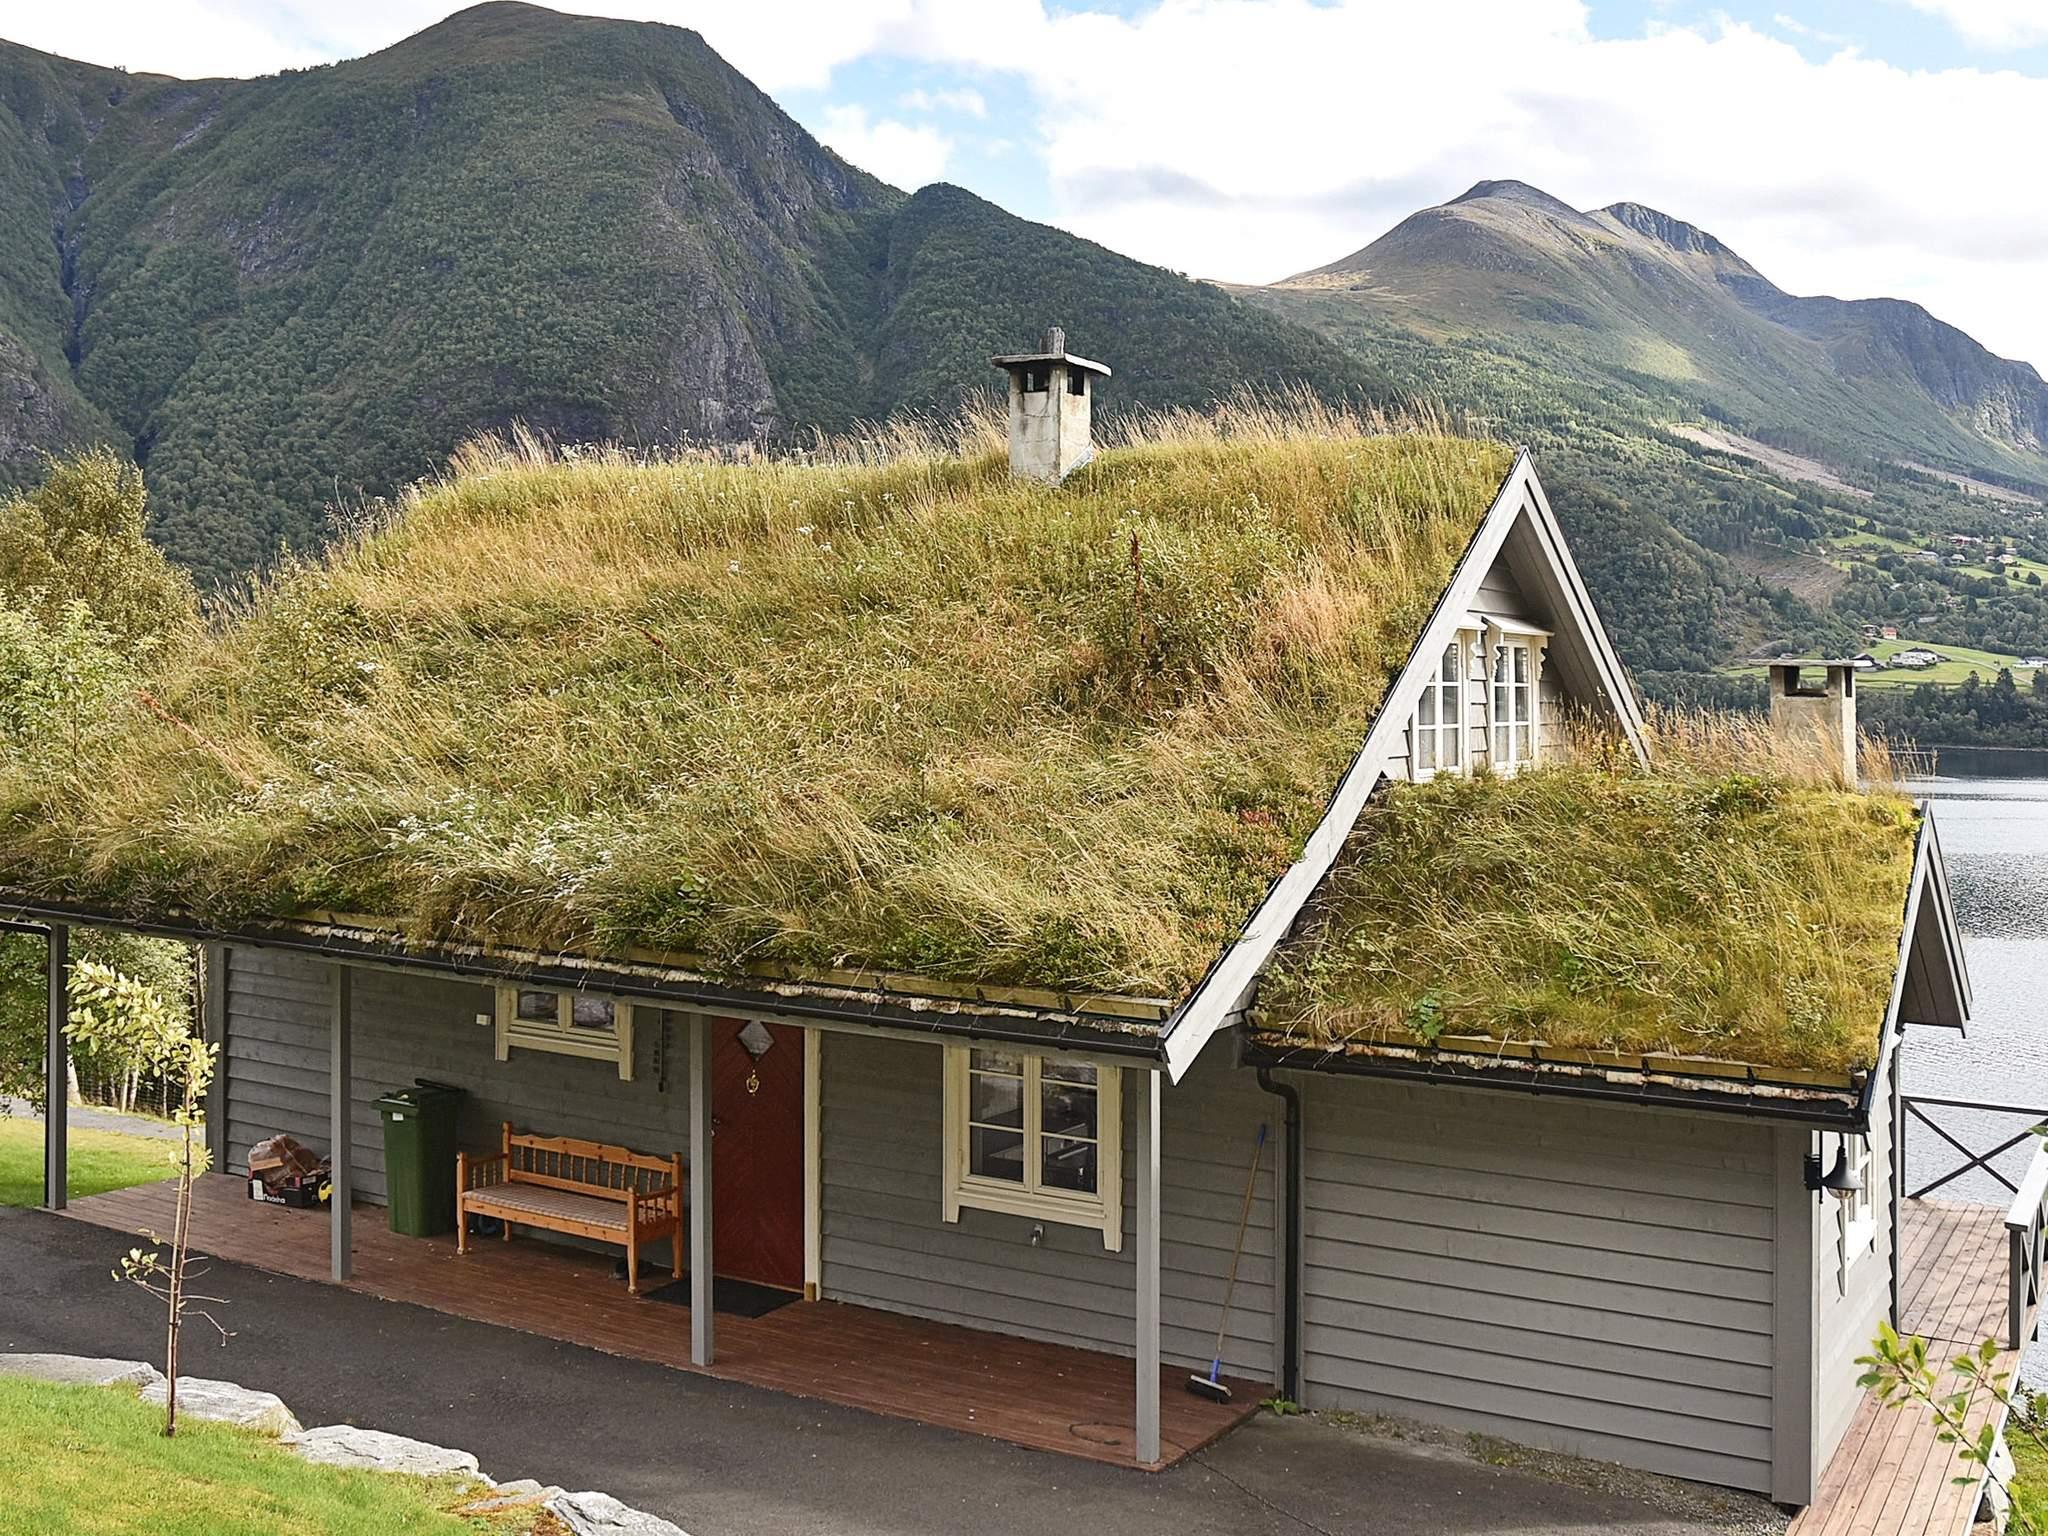 Ferienhaus Innselsetbygda (1043168), Lauvstad, More - Romsdal, Westnorwegen, Norwegen, Bild 24